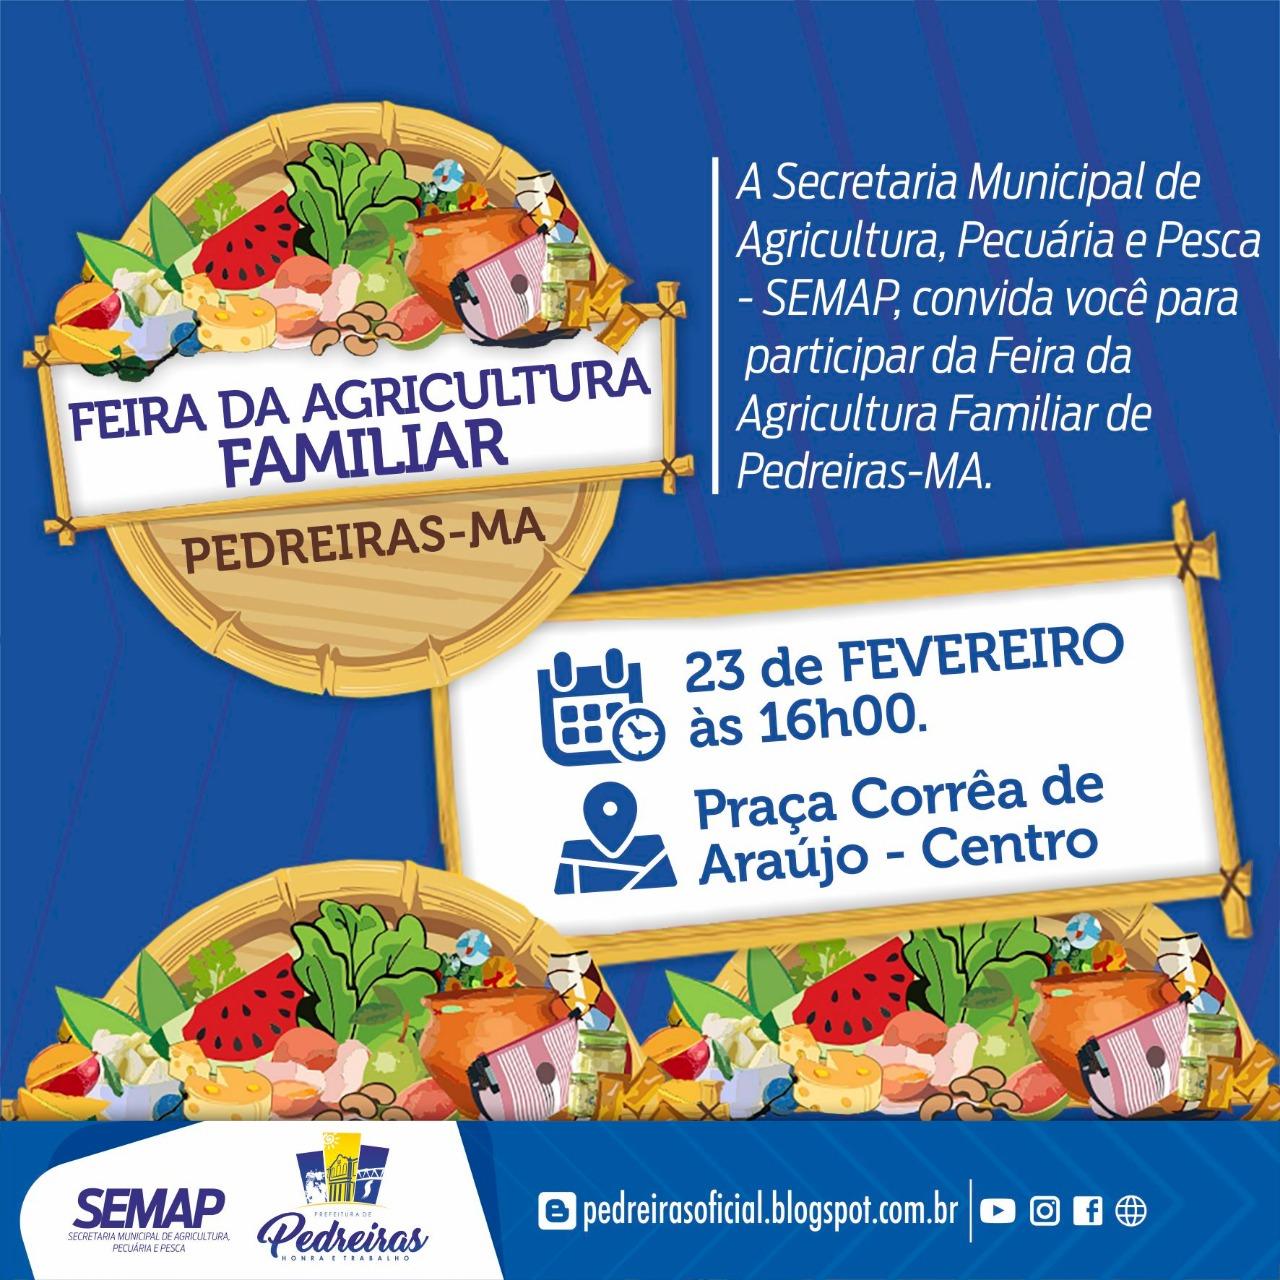 FEIRA DA AGRICULTURA FAMILIAR